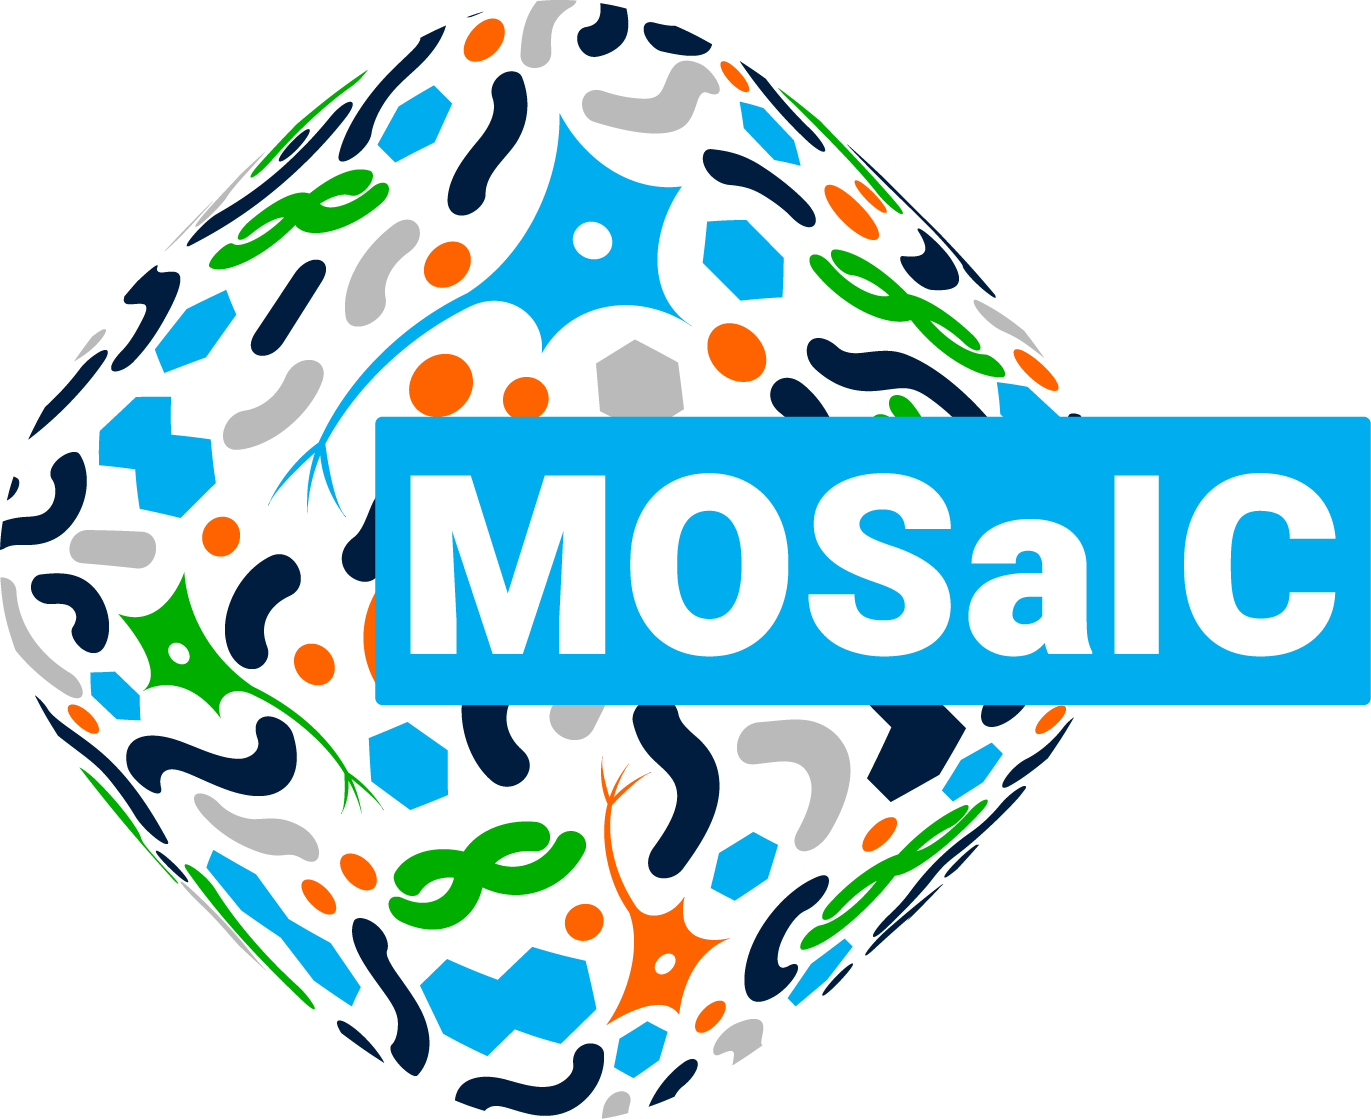 mosaic test